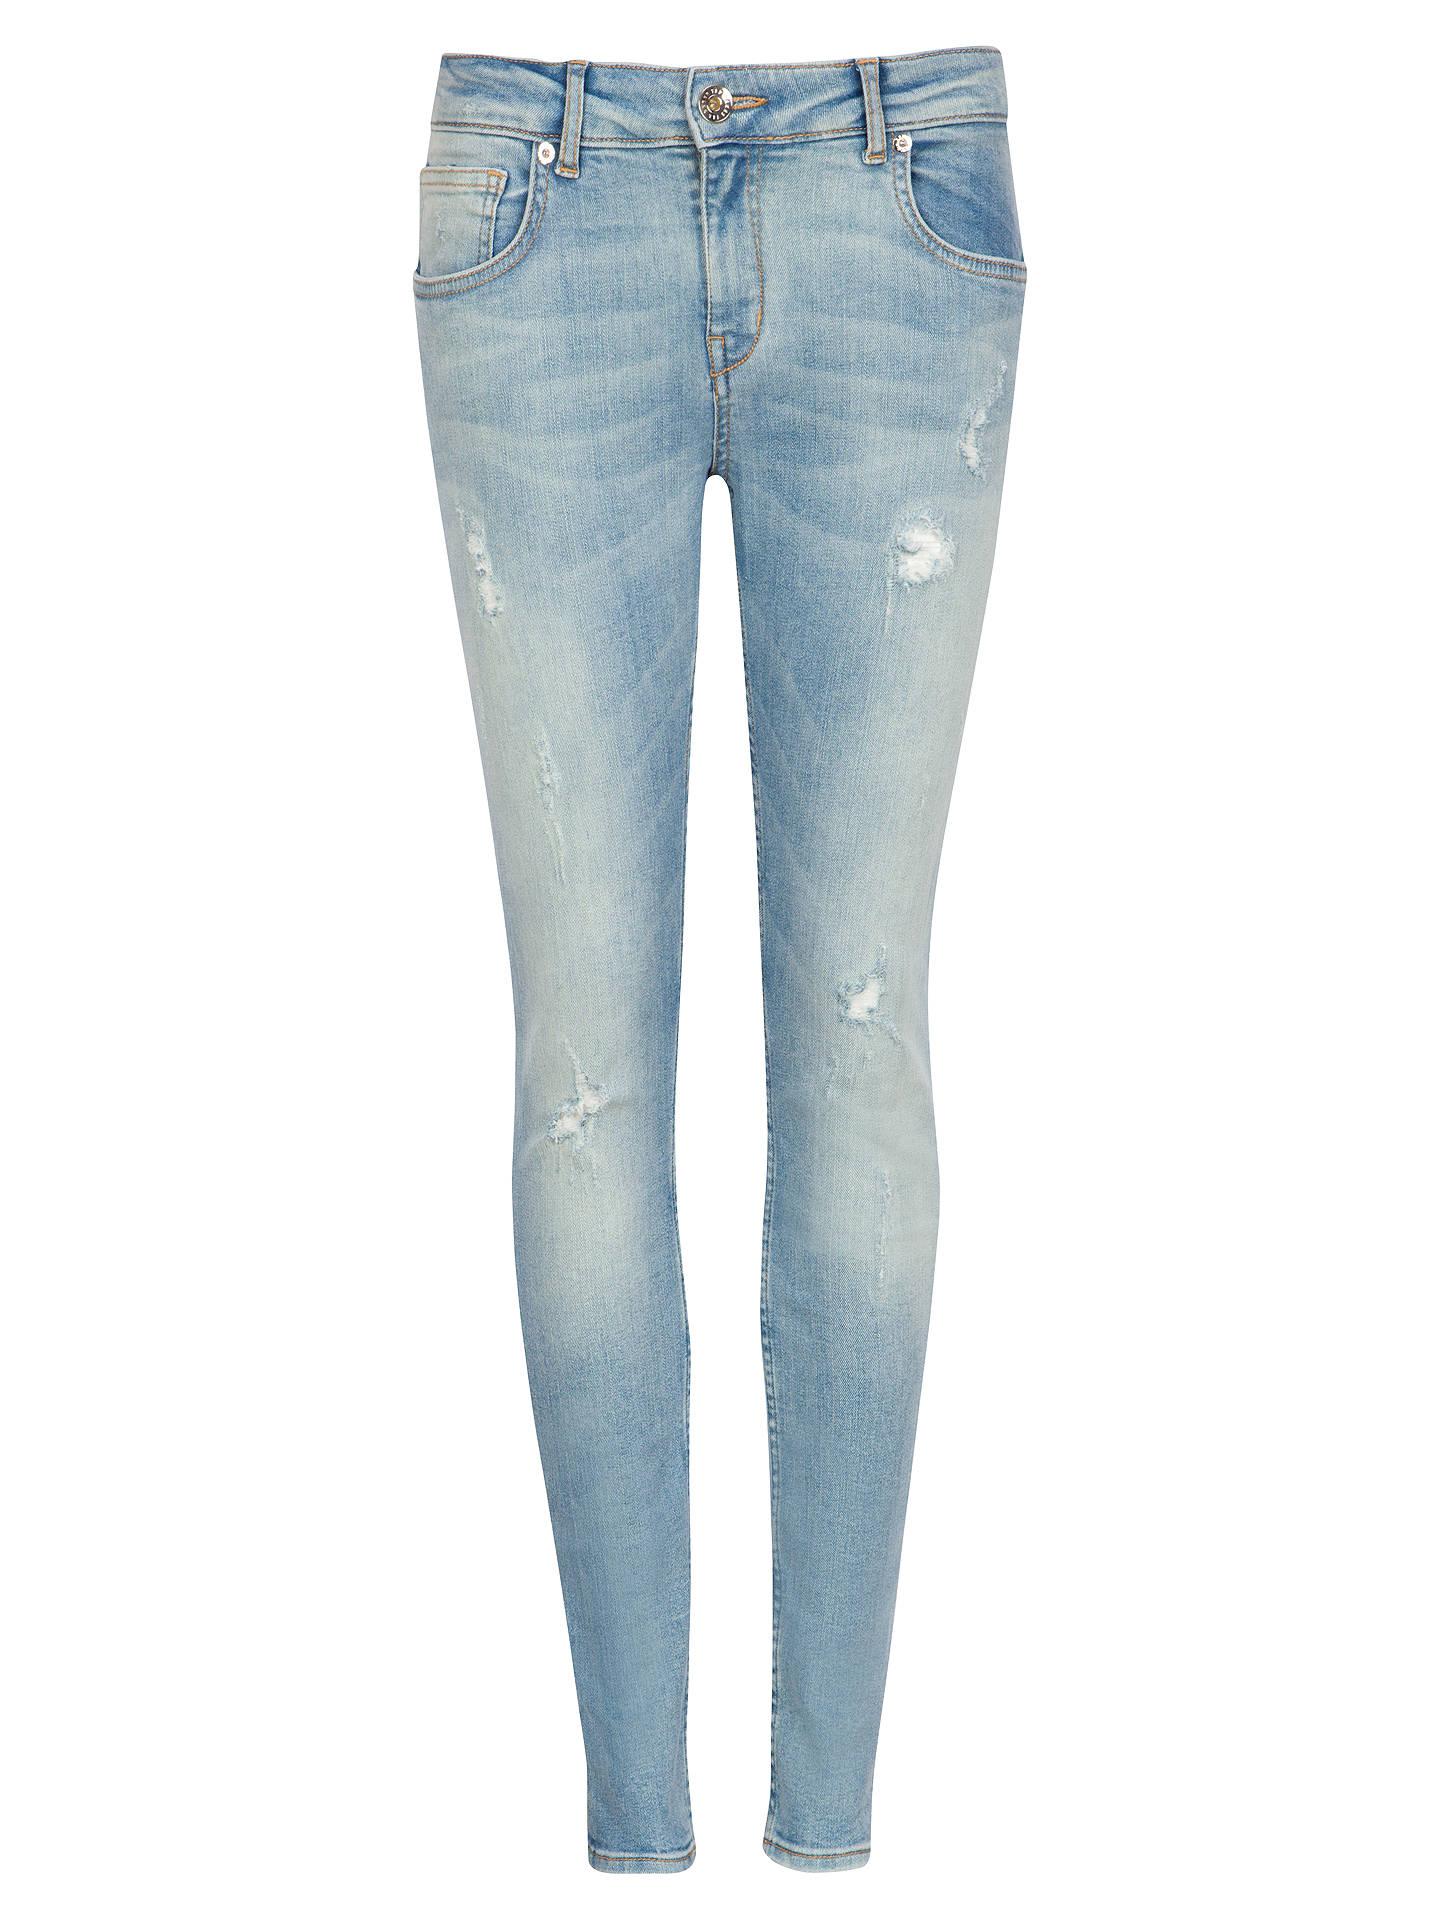 e90f88559 Buy Ted Baker Abrasion Skinny Jeans